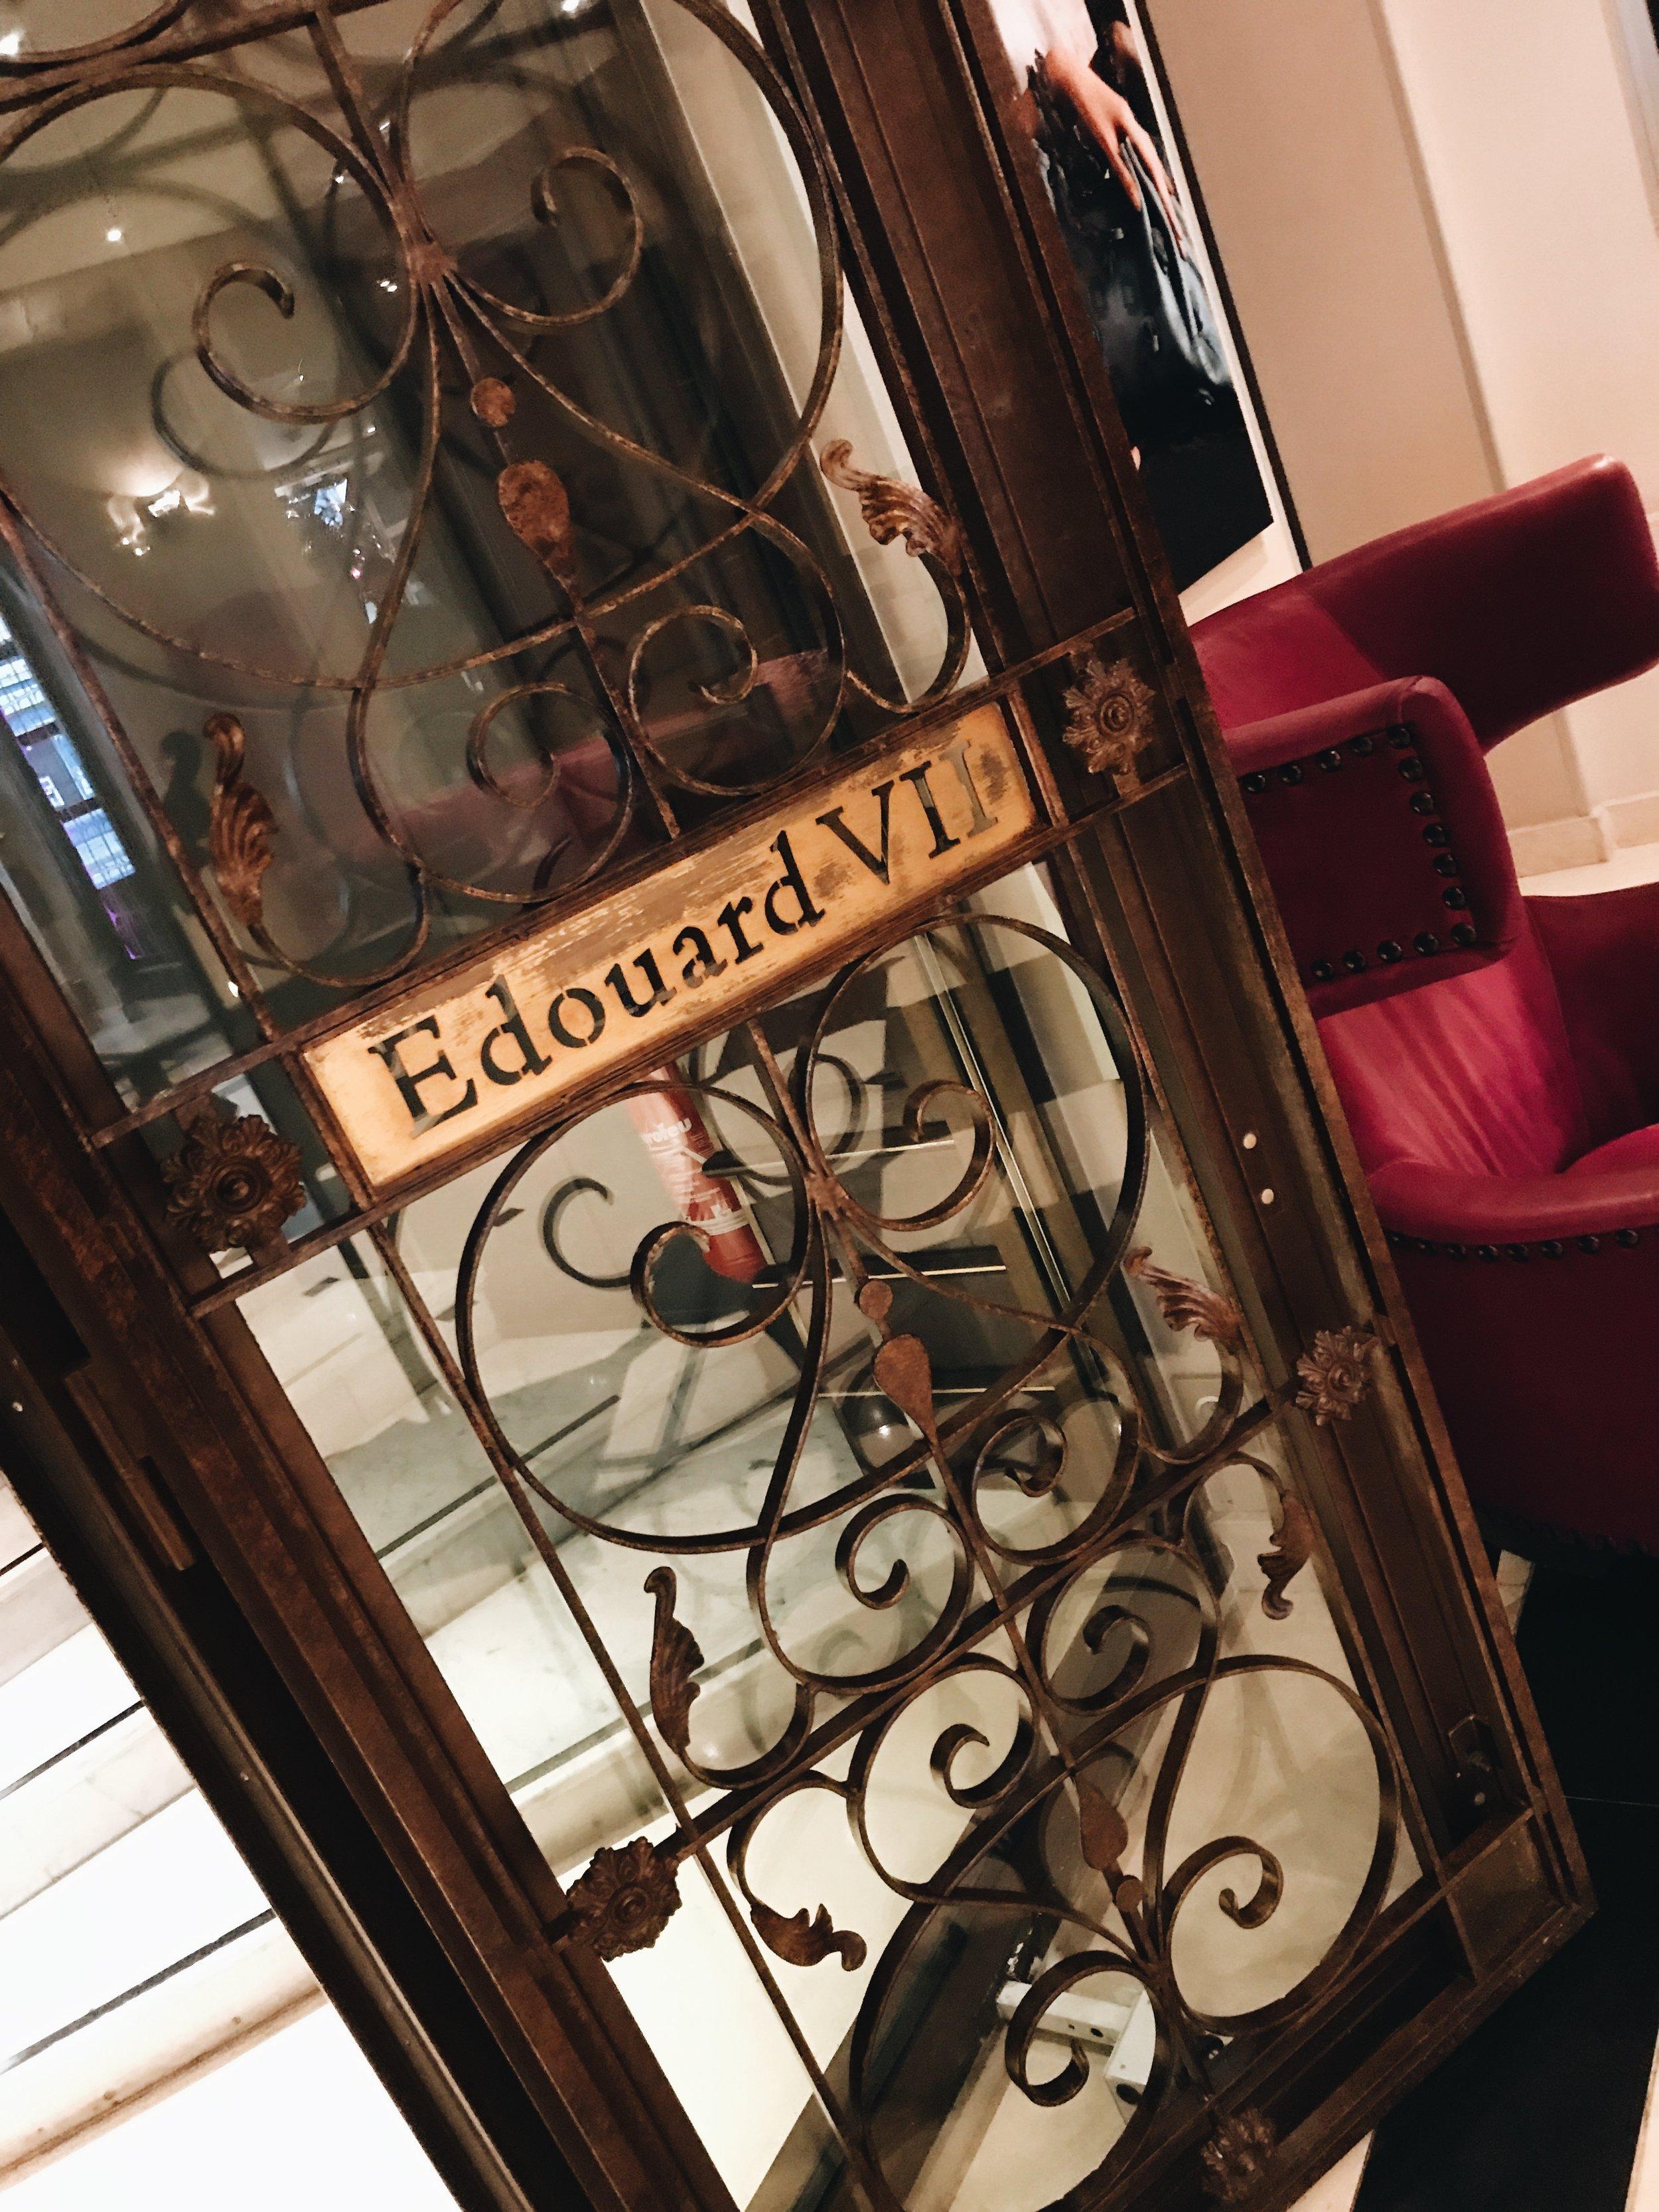 Decor details at Hotel Edouard 7, Paris